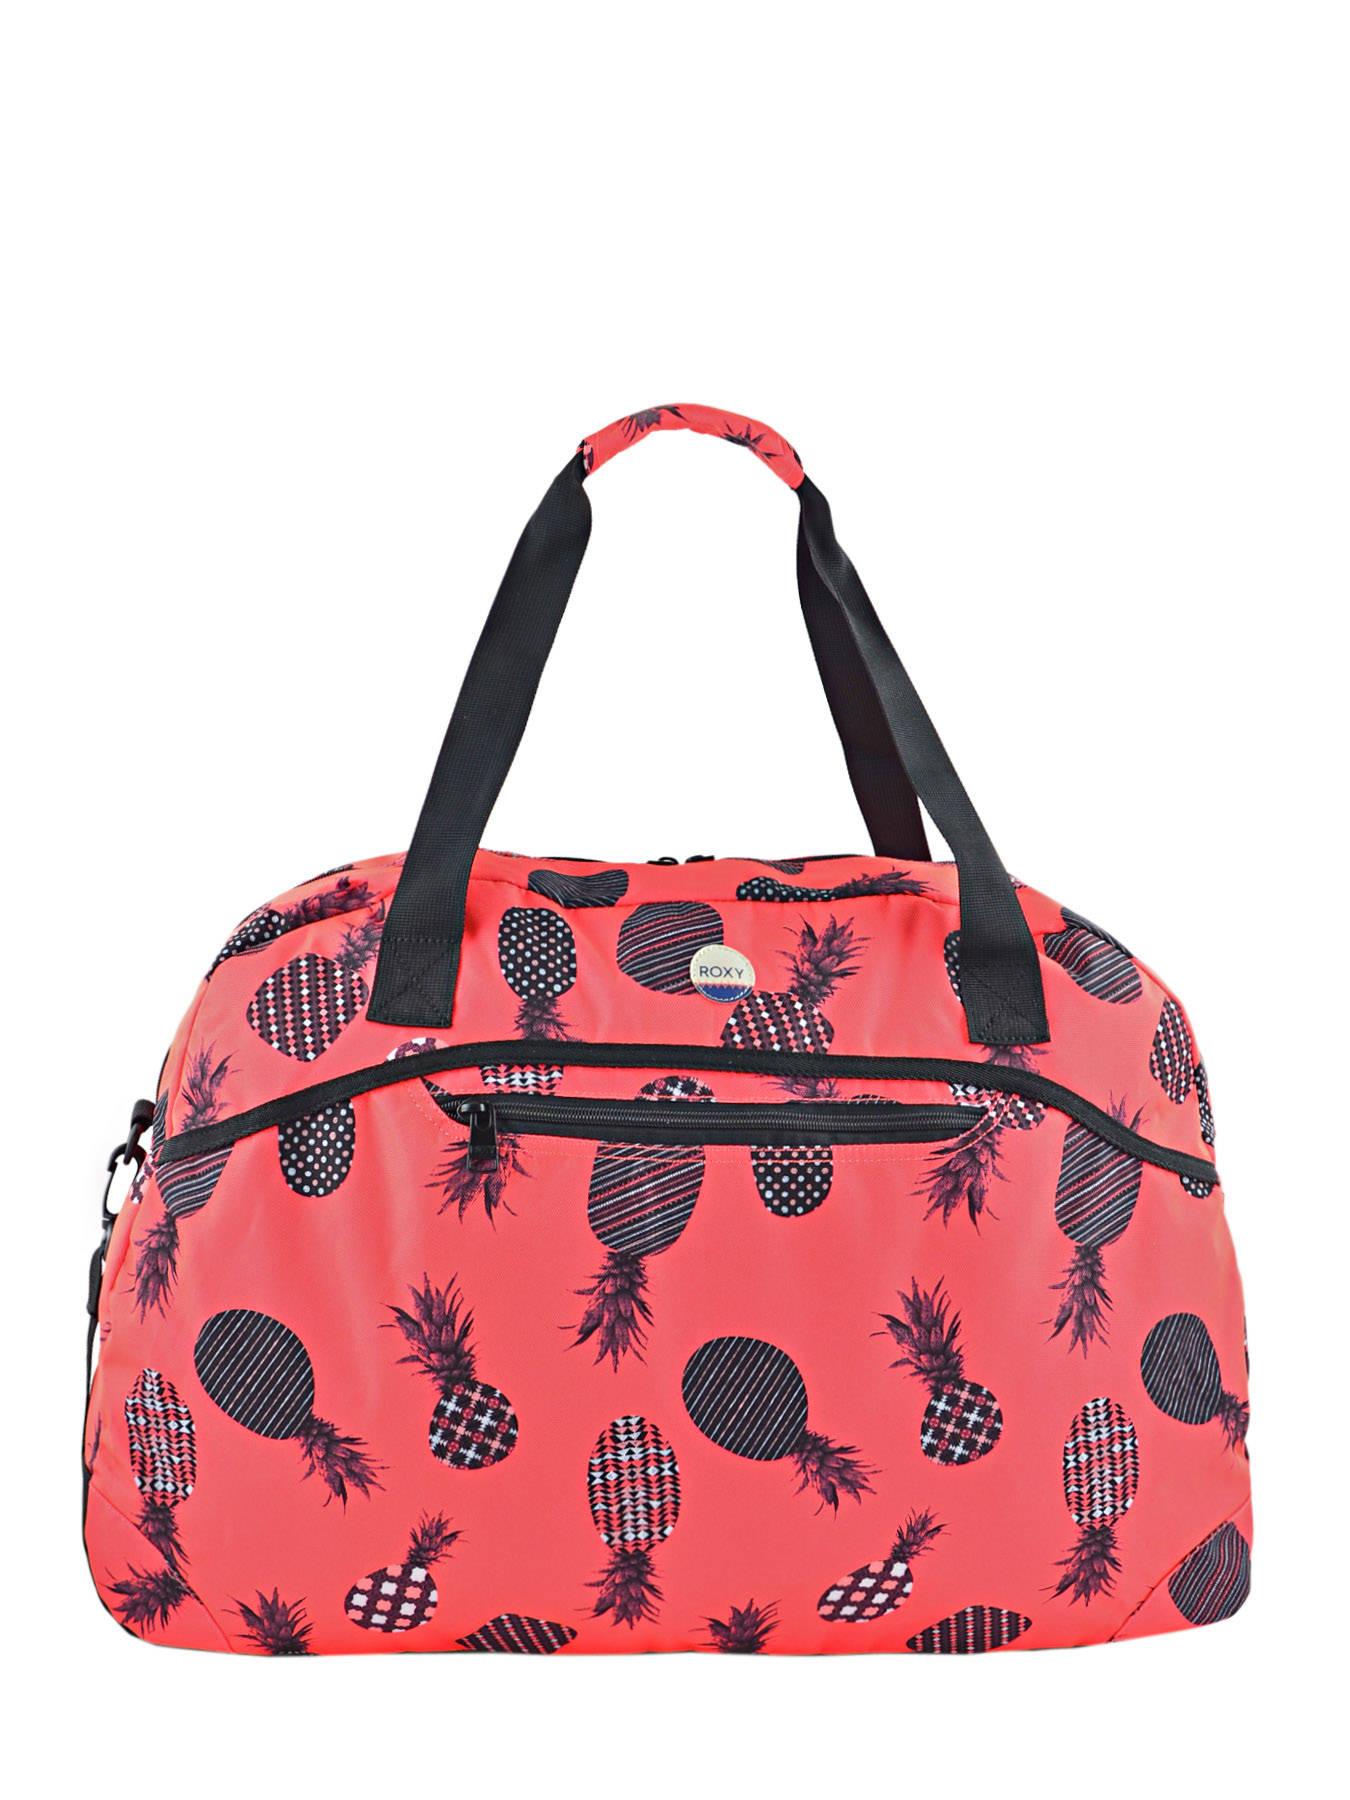 sac de voyage roxy luggage luggage en vente au meilleur prix. Black Bedroom Furniture Sets. Home Design Ideas